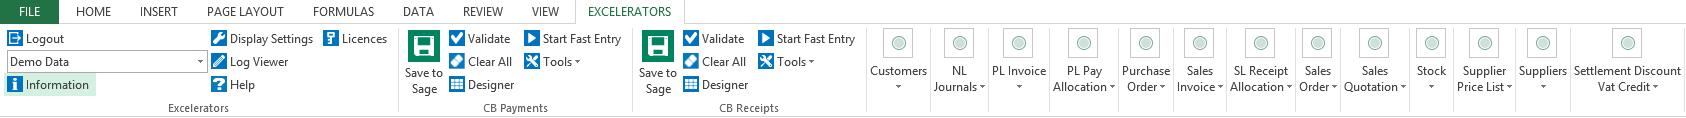 Excel Tab